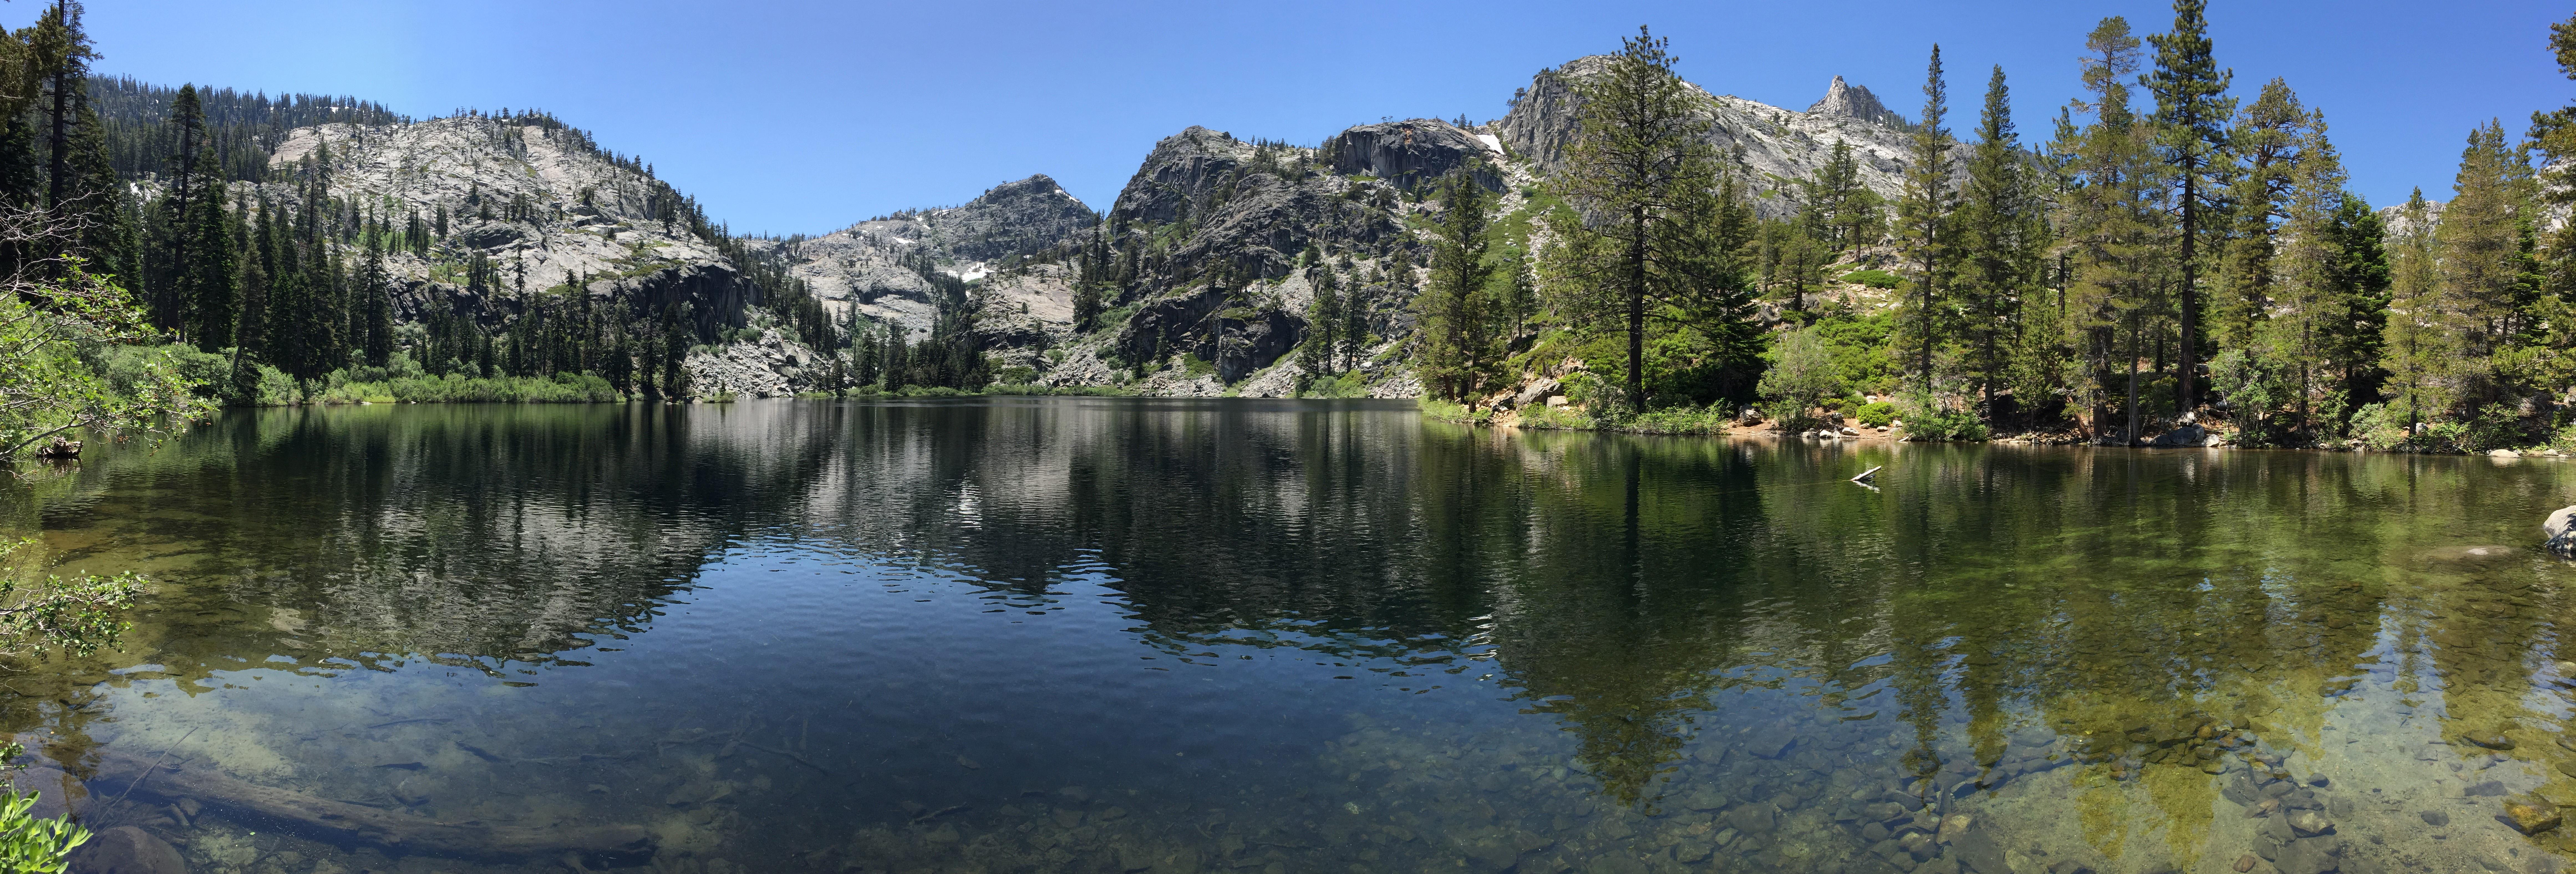 Beautiful Lake Tahoe Landscape And Lake Image